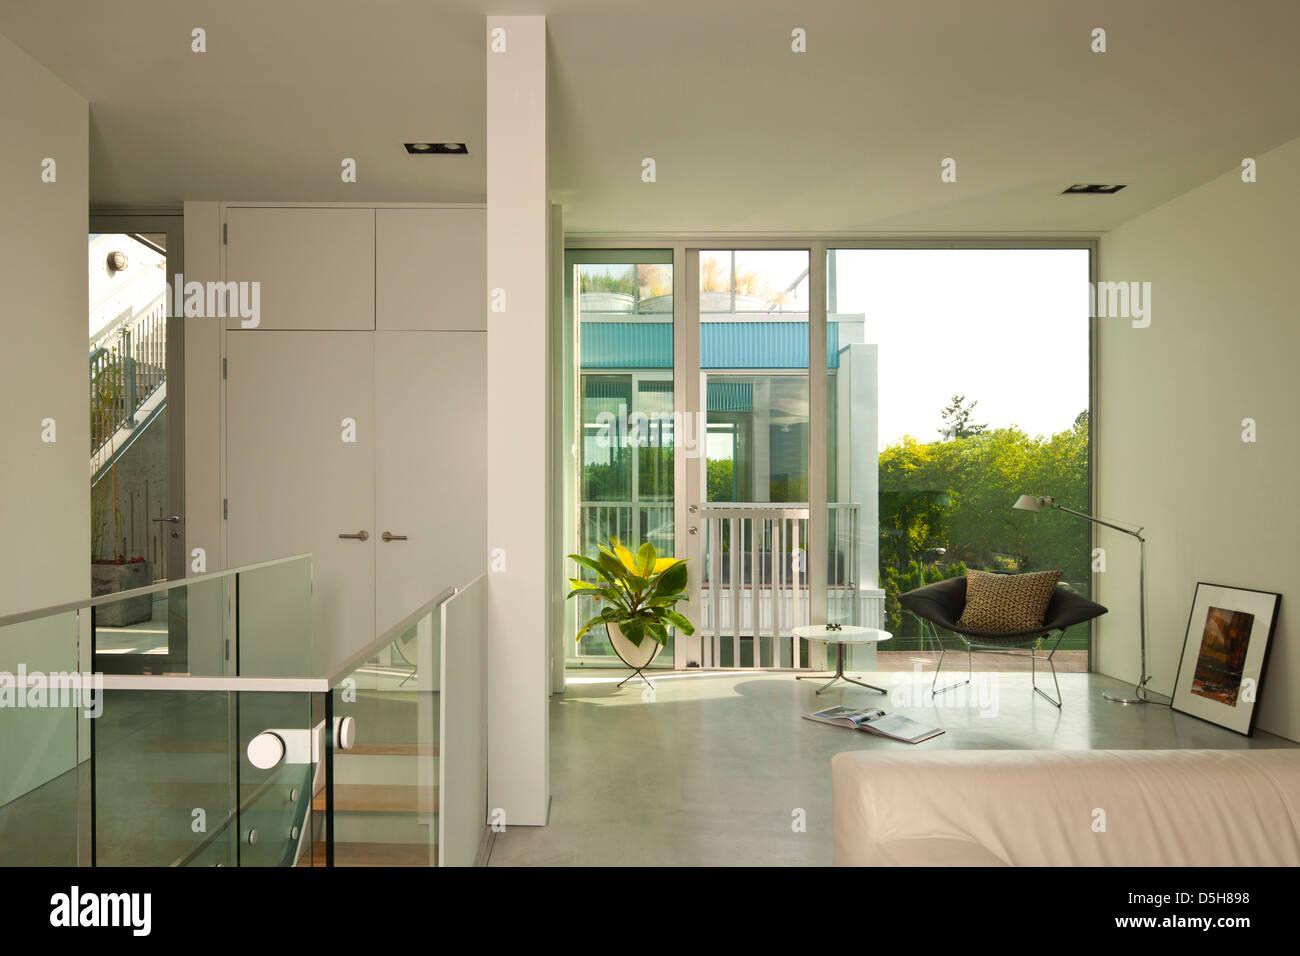 architect lwpac 2012 living room interior - Interior Design Living Room 2012